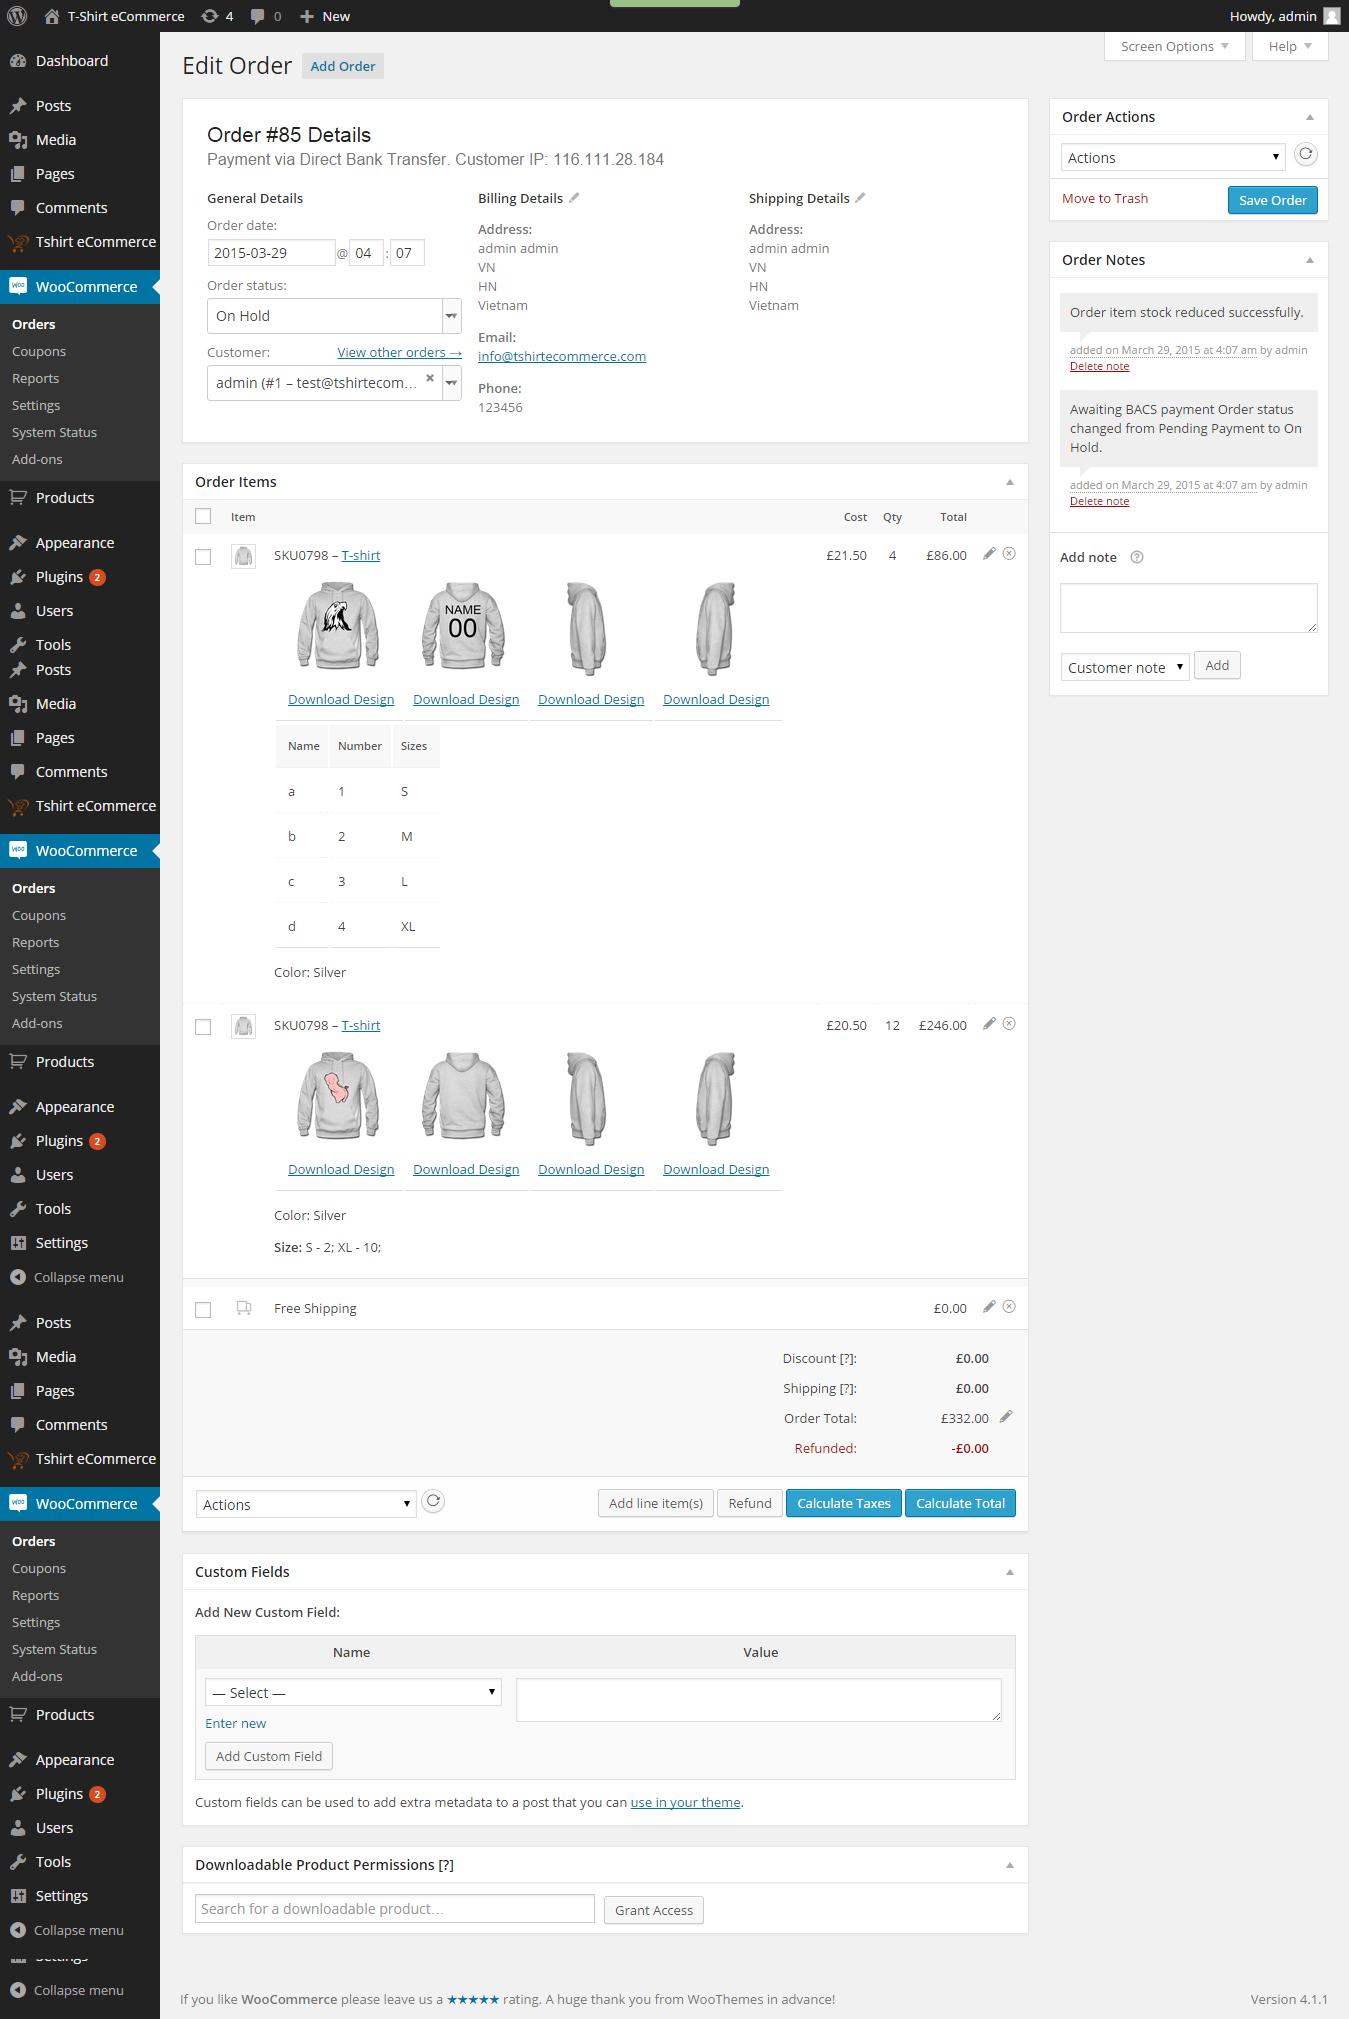 Shirt design app for pc - 1 Png 2 Designer Ipad Png 3 Png 4 Png 5 Png 6 Png 7 Png